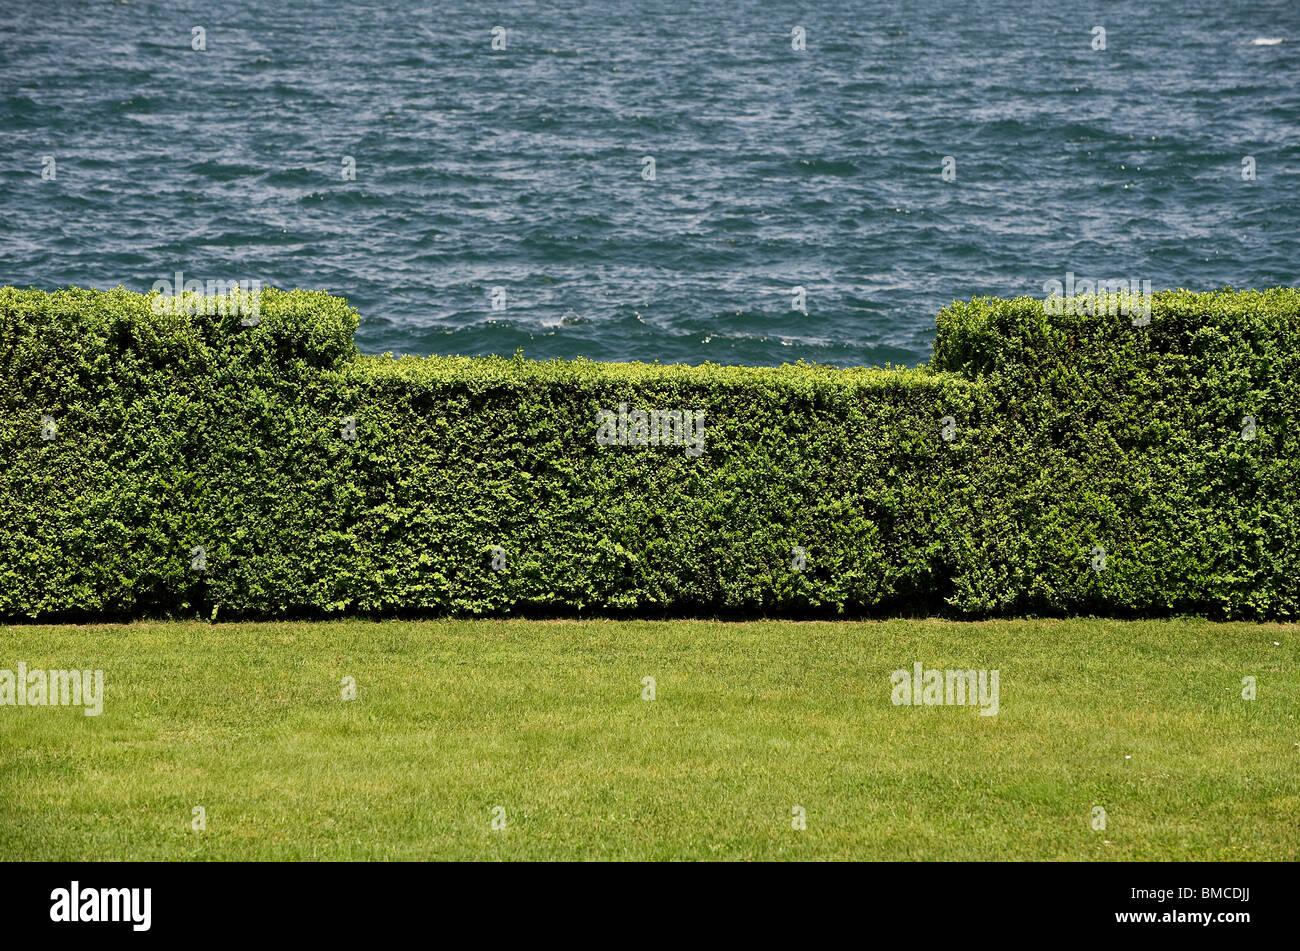 abgeschnitten Garten Hecke Lago Maggiore Italien Stockfoto